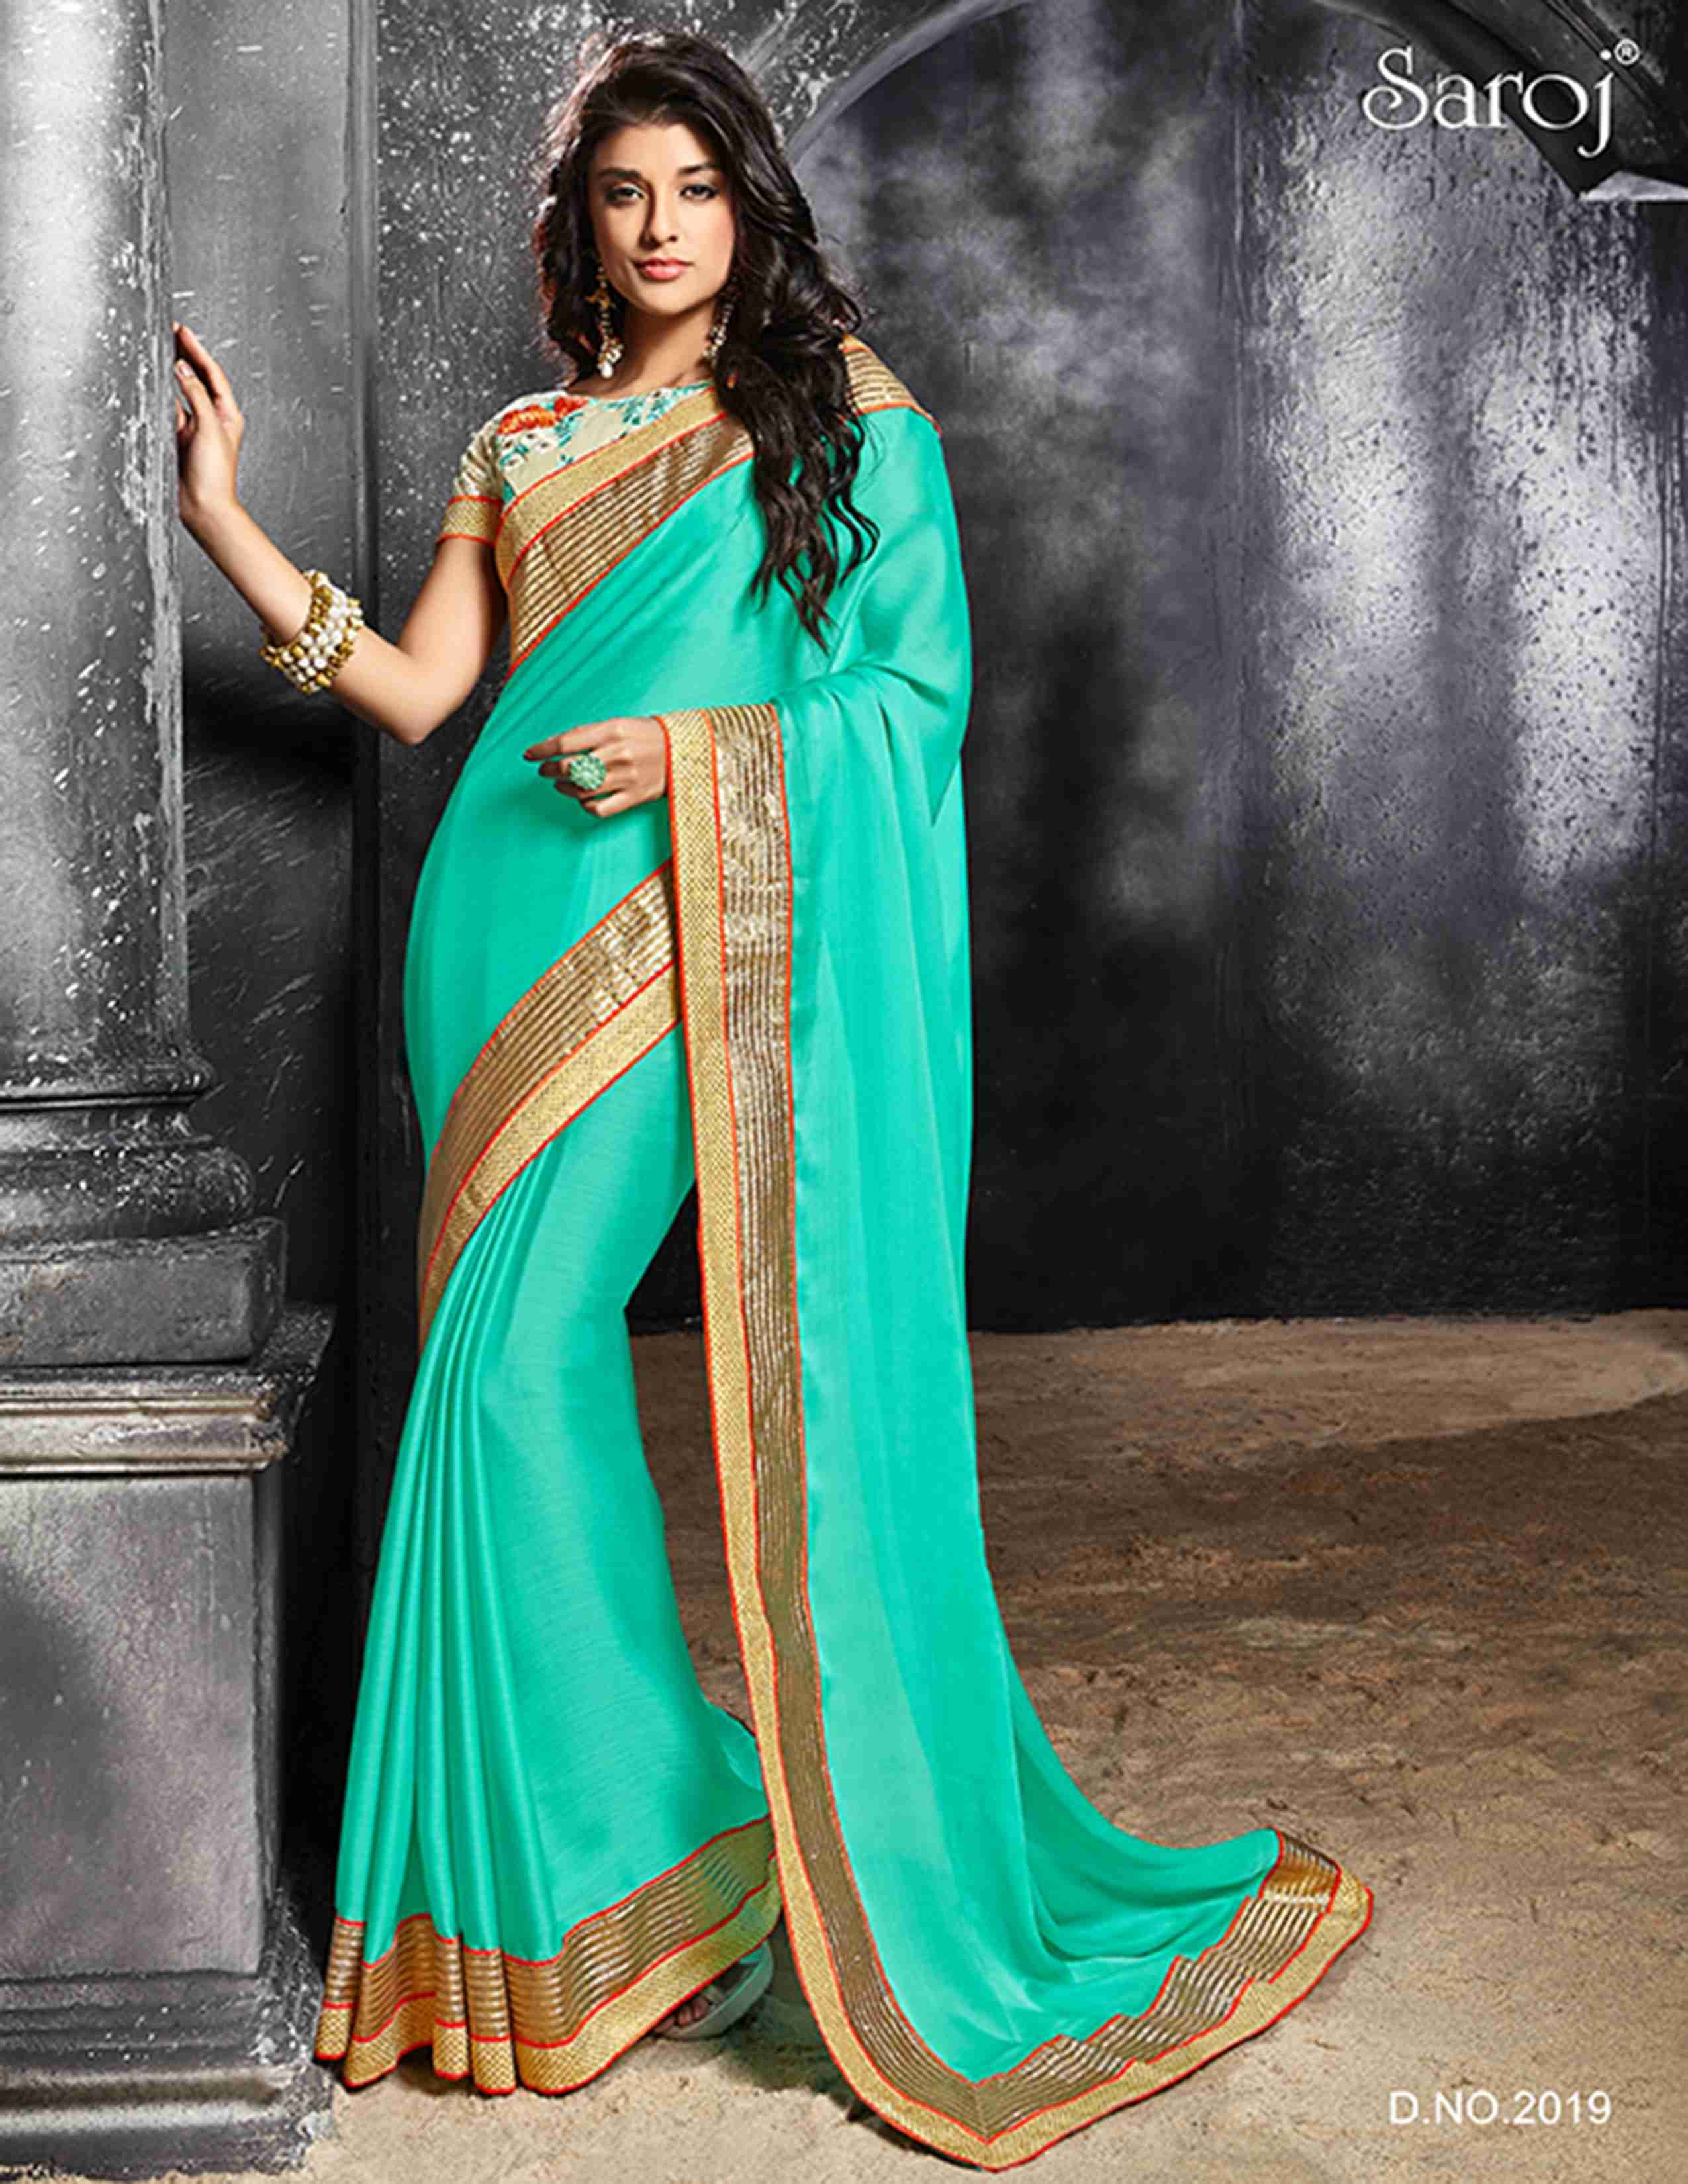 Pin by Sudeep on Beautiful dresses | Pinterest | Saree